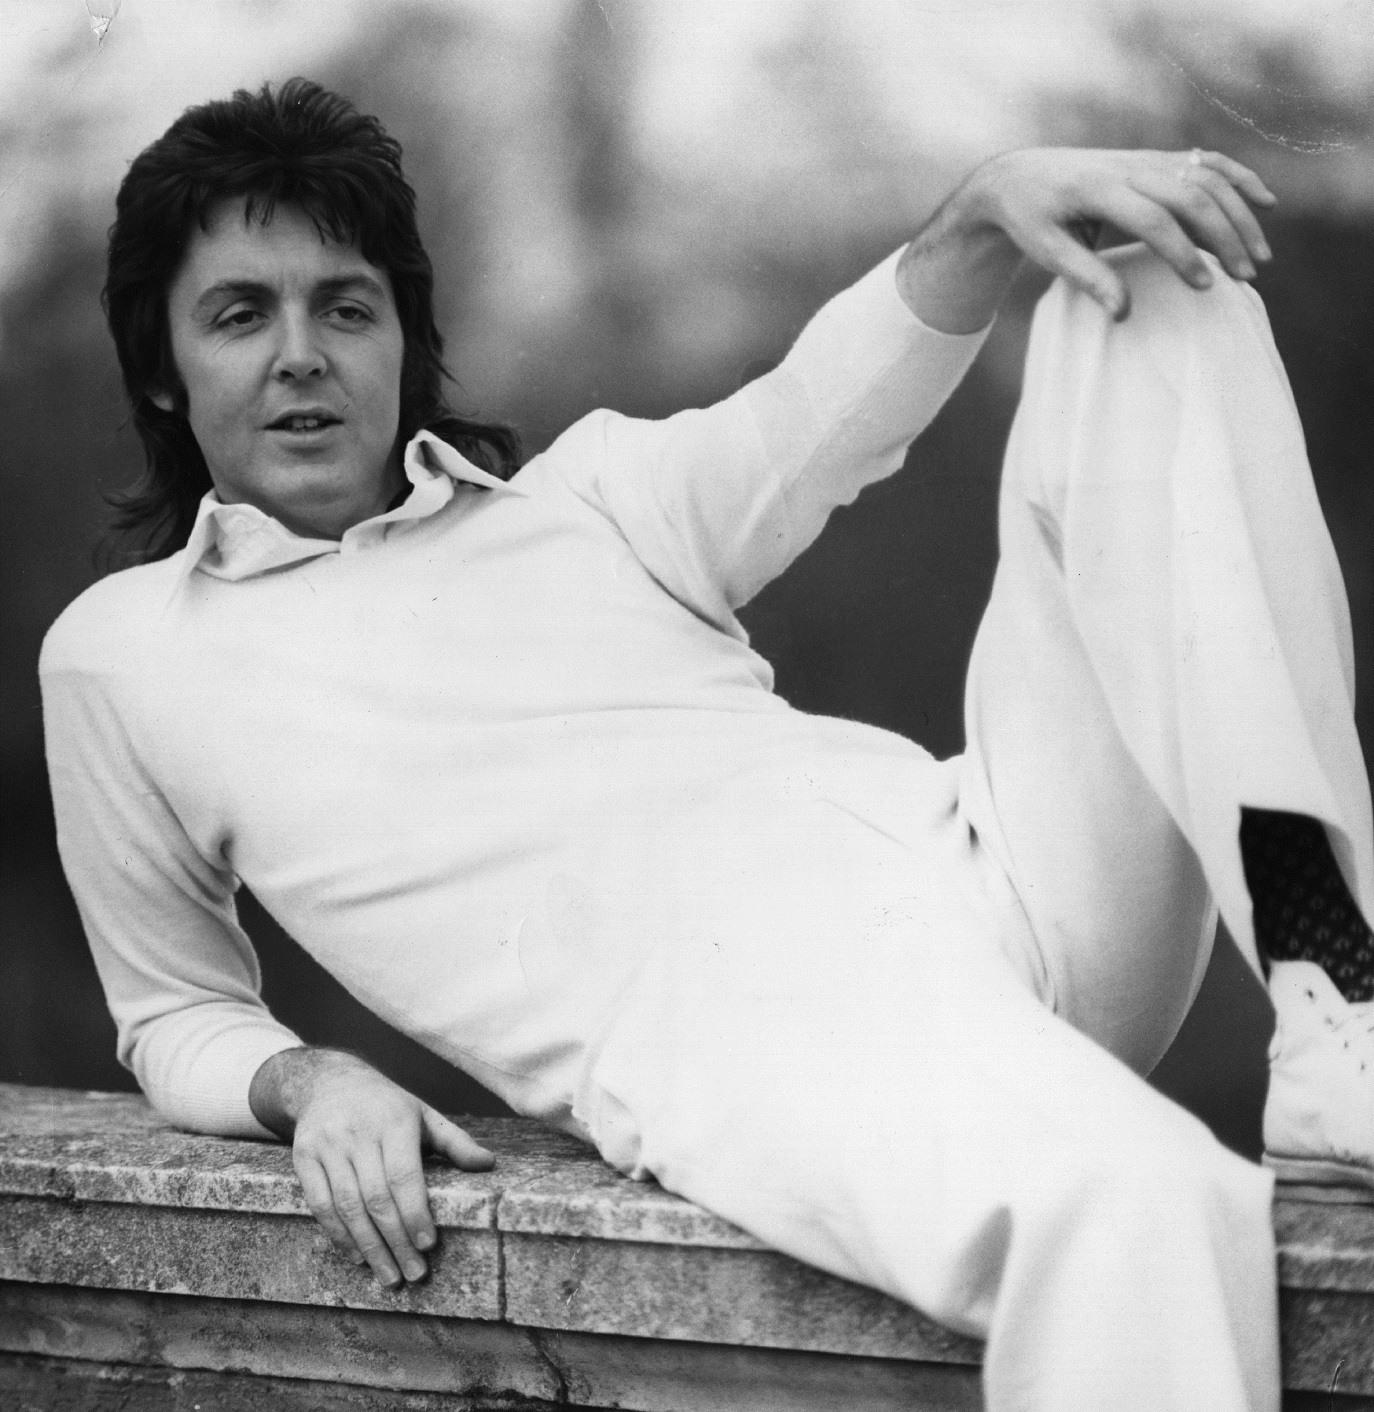 Paul McCartney sporting a fantastic mullet.